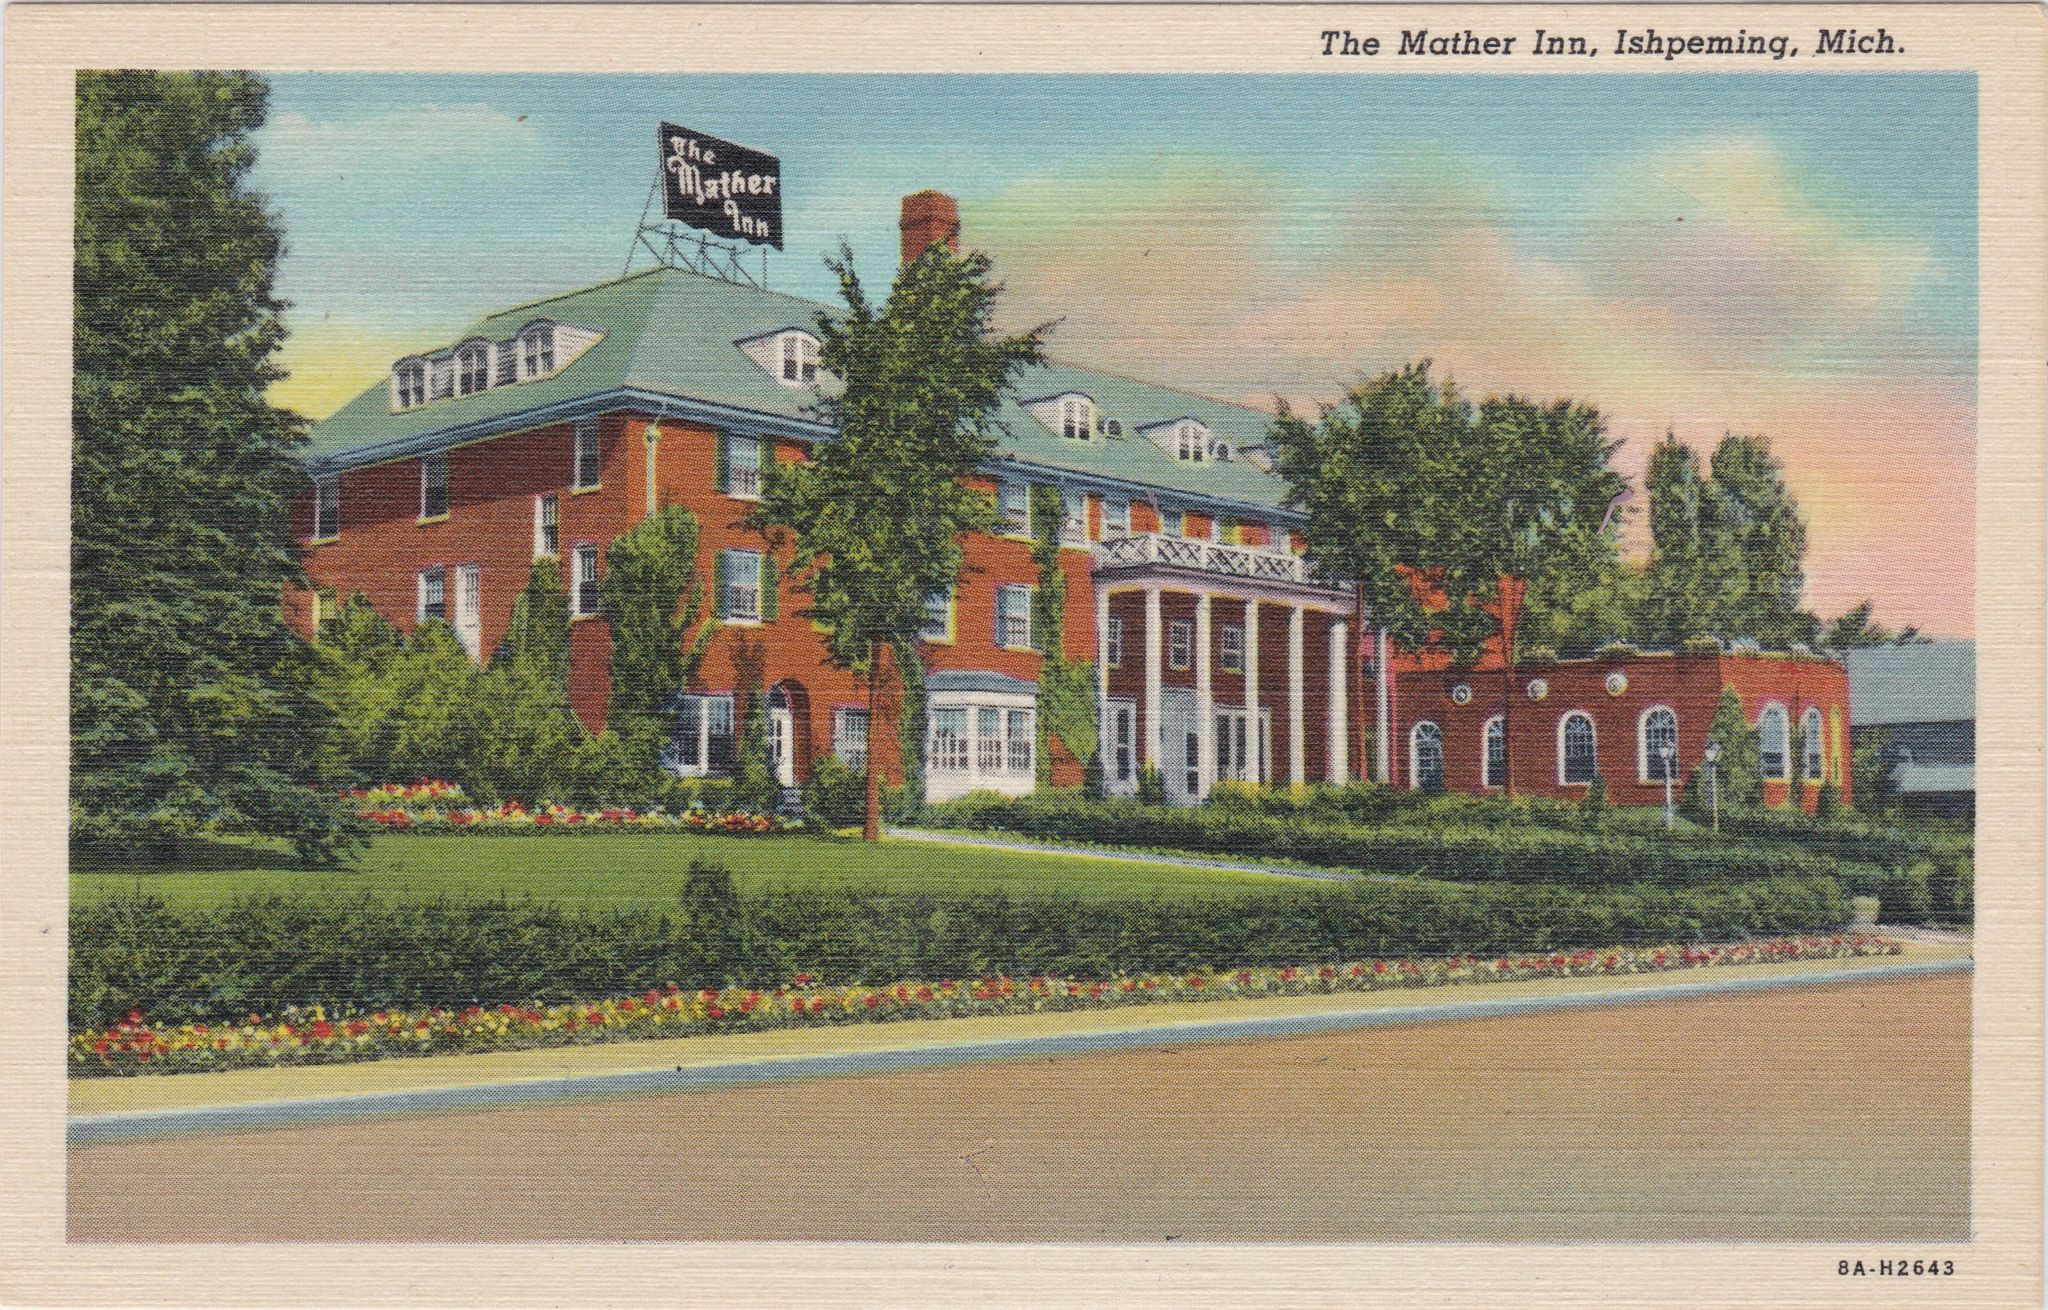 UP Ishpeming MI THE MATHER INN opened 1932 named for William G ...